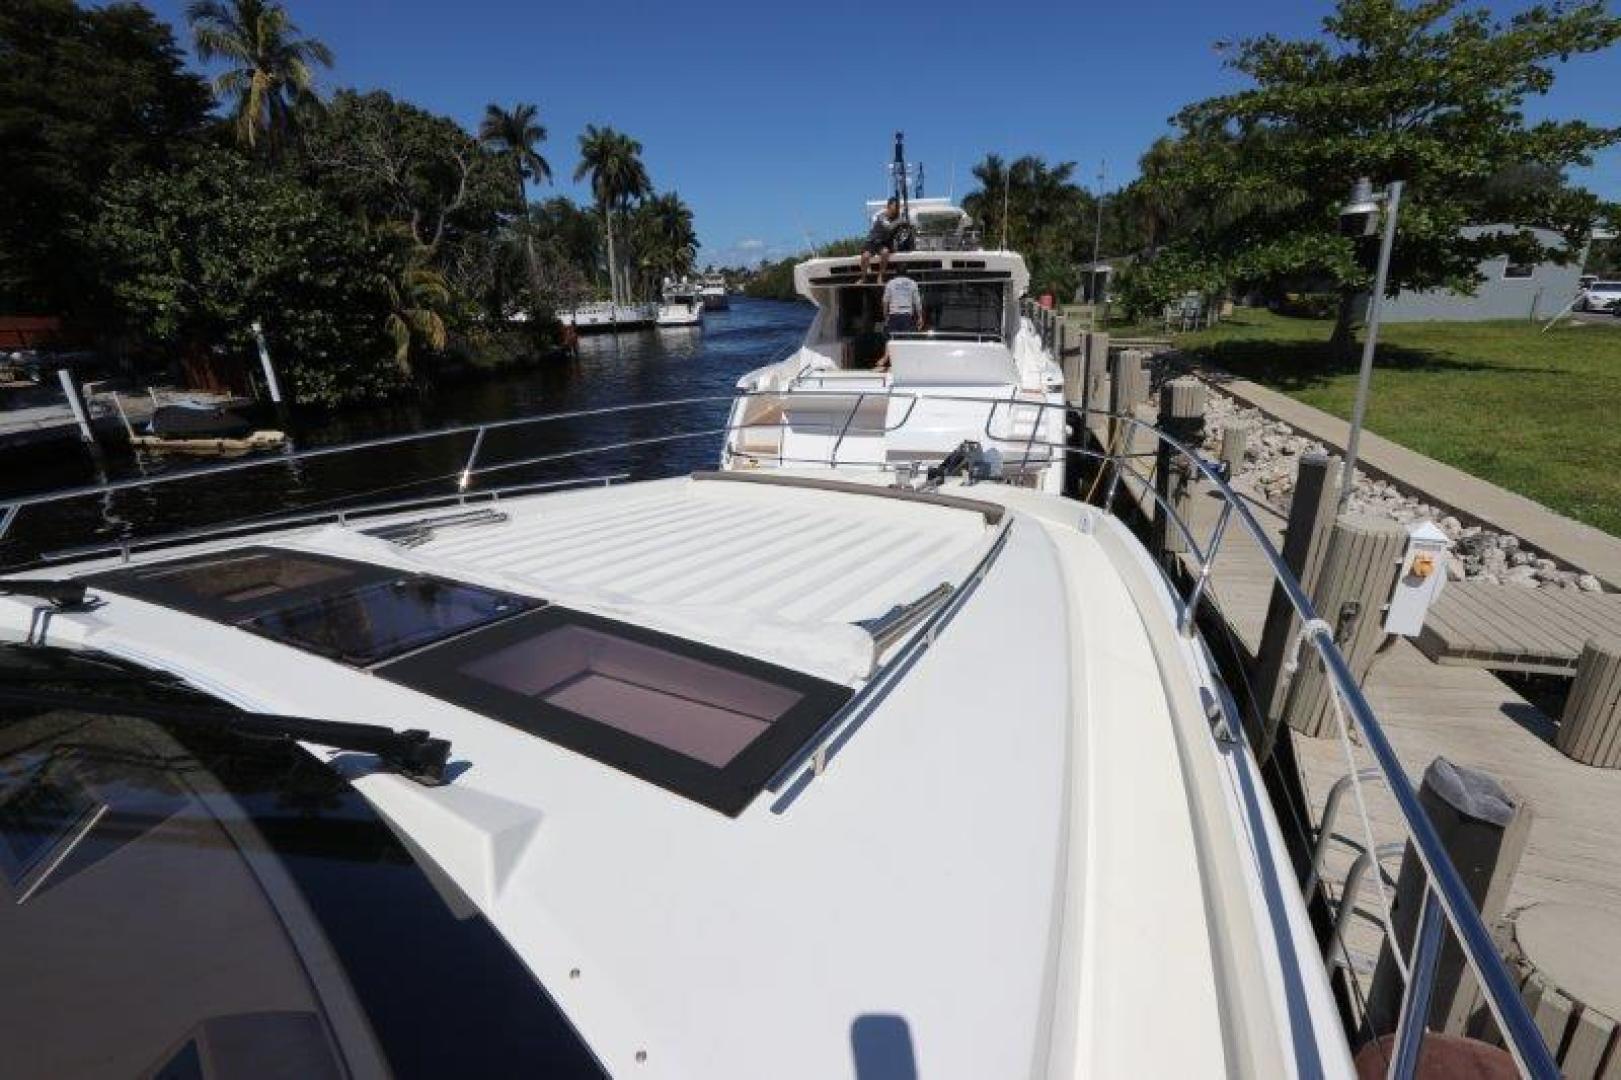 Prestige-Motoryacht 2017-Breathe Easy Fort Lauderdale-Florida-United States-1303866   Thumbnail